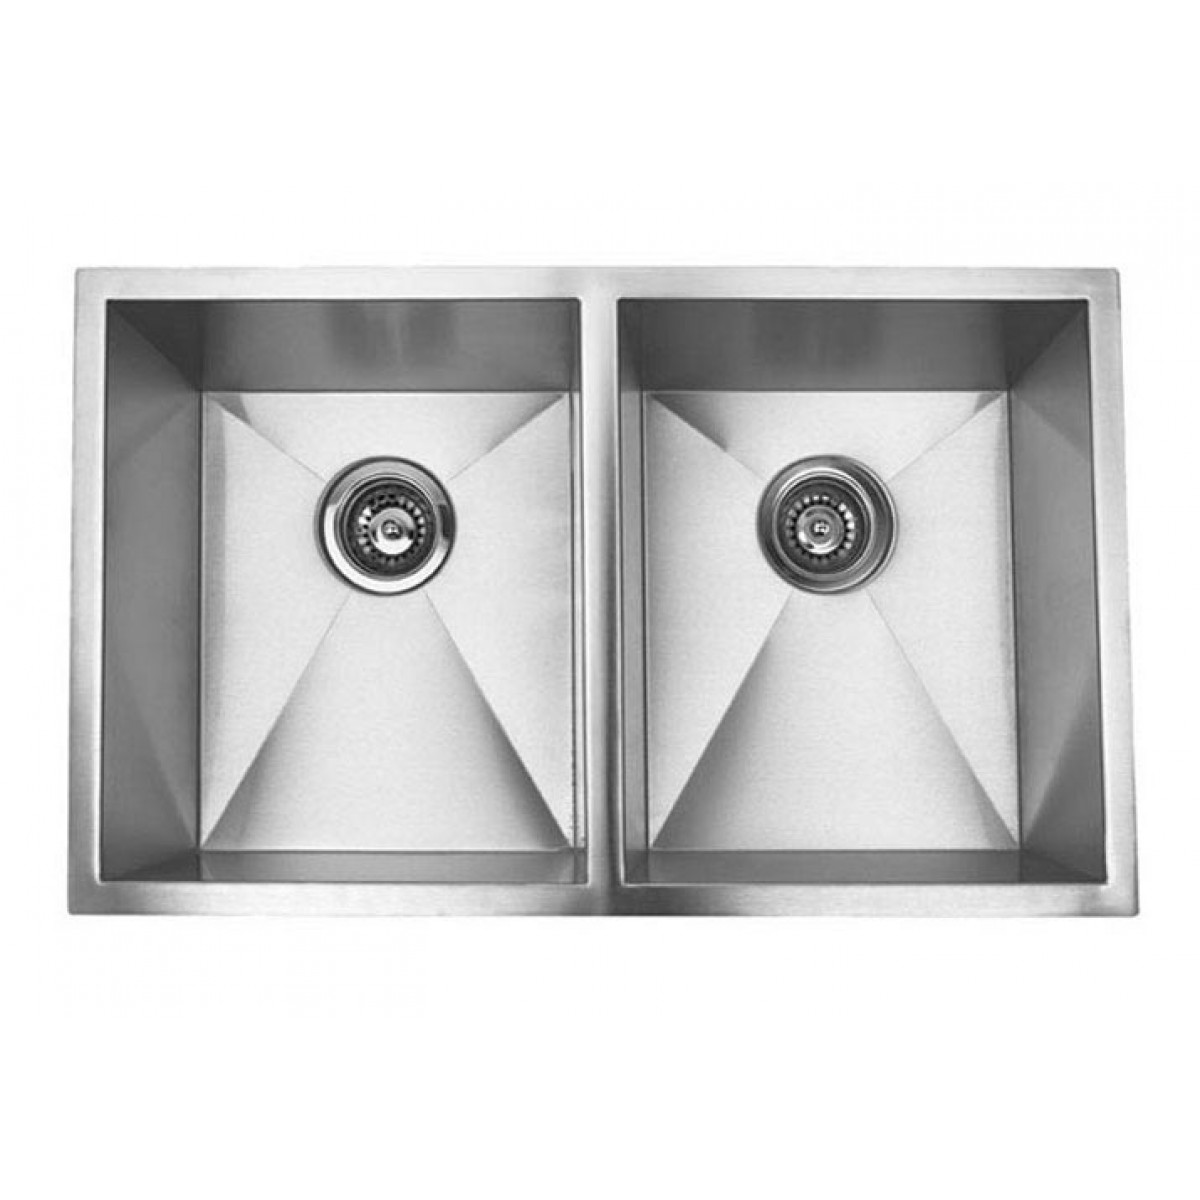 Double Bowl Kitchen Sinks 32 inch stainless steel undermount 5050 double bowl kitchen sink 32 inch stainless steel undermount 5050 double bowl kitchen sink zero radius design workwithnaturefo